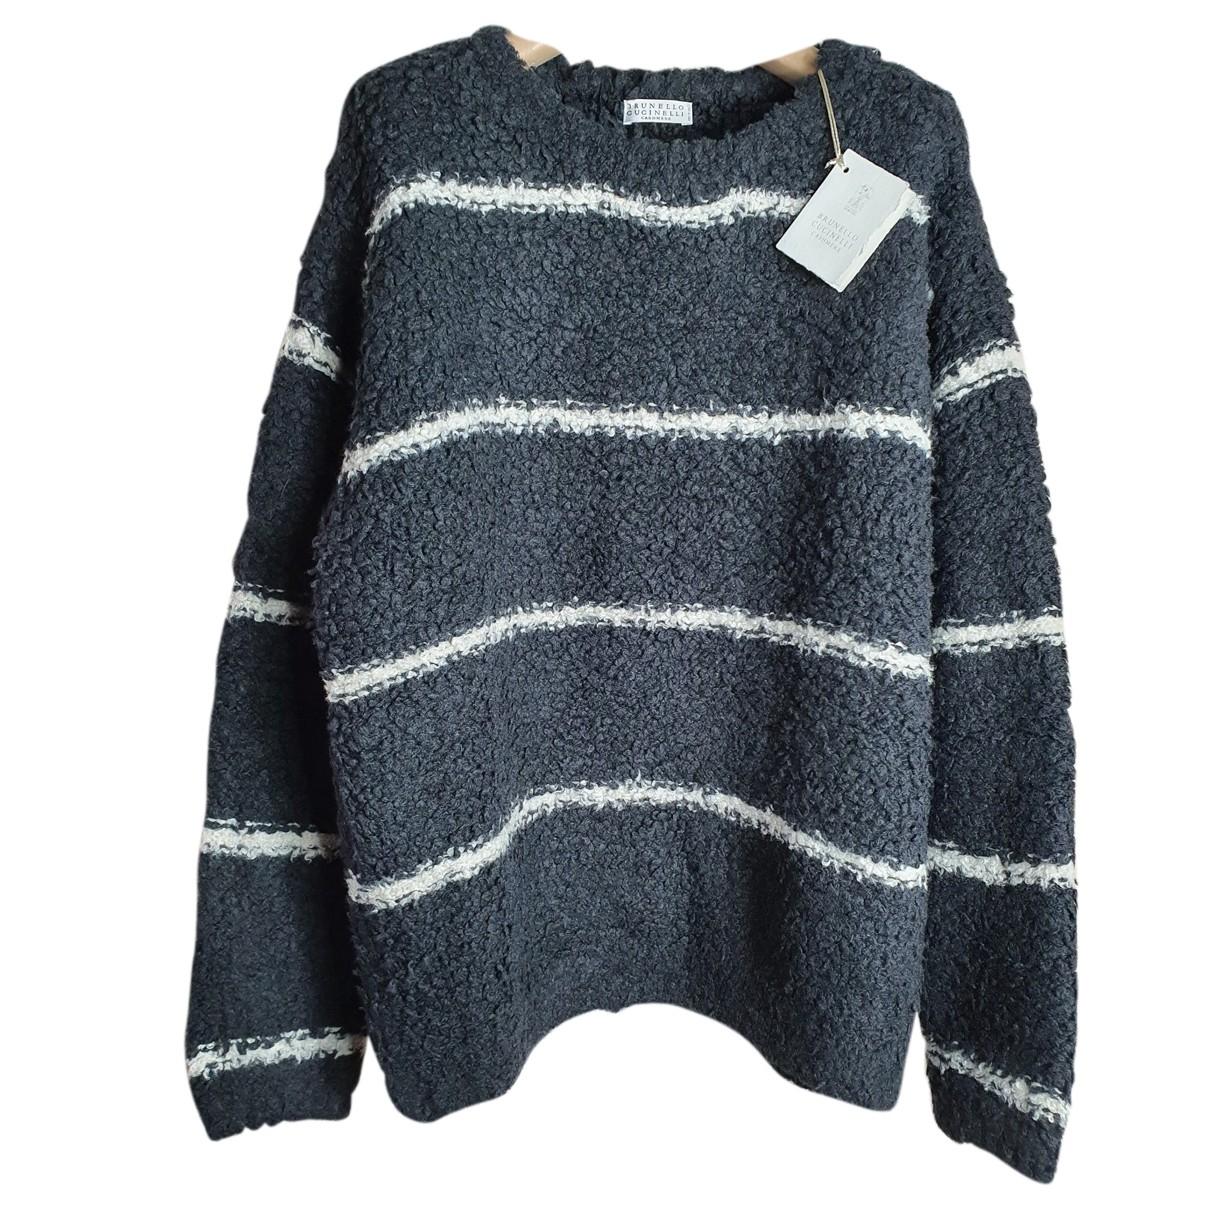 Brunello Cucinelli N Black Cashmere Knitwear for Women M International